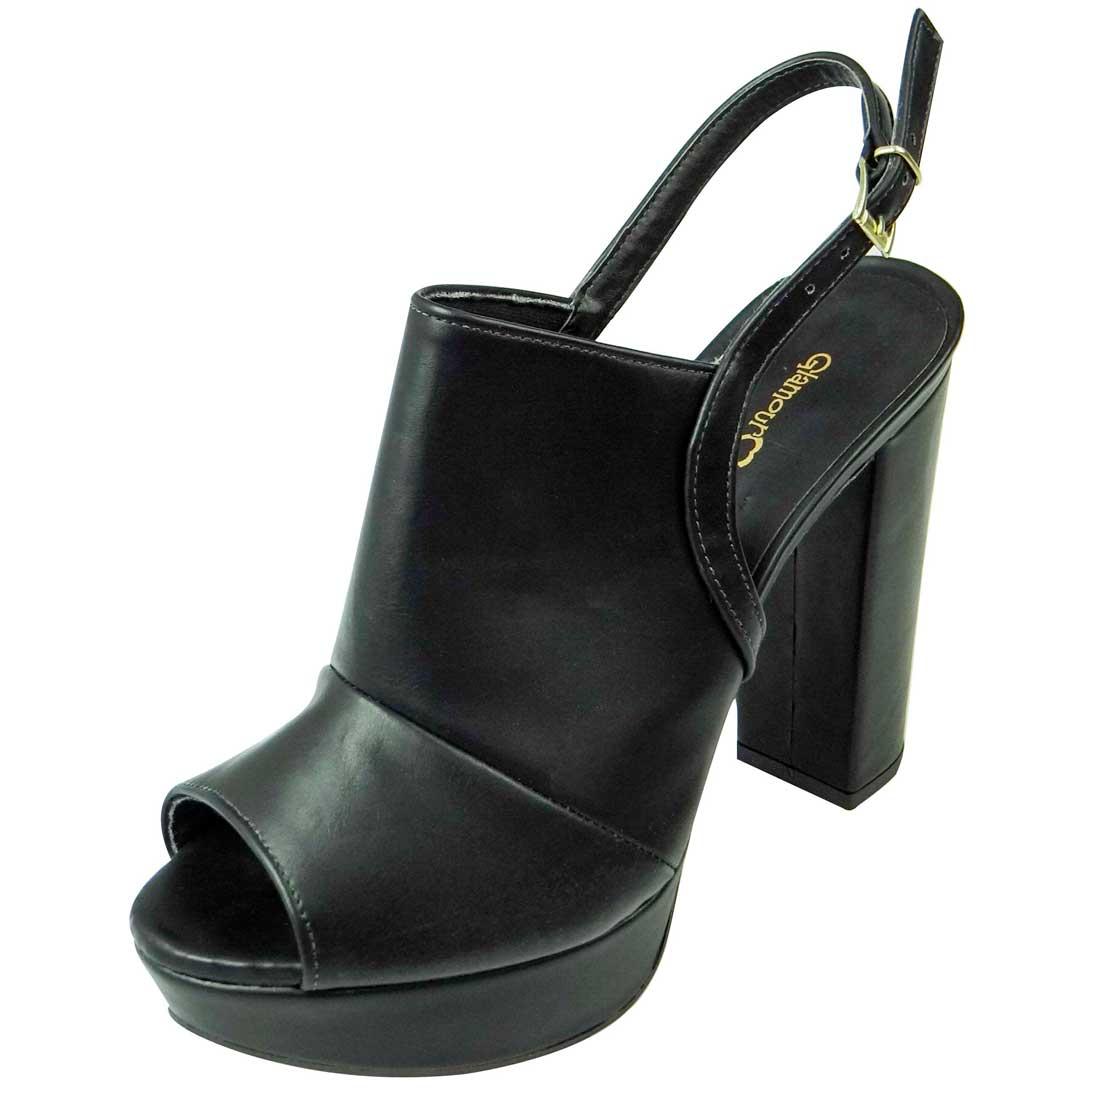 Sandal Boot Meia Pata - Preta